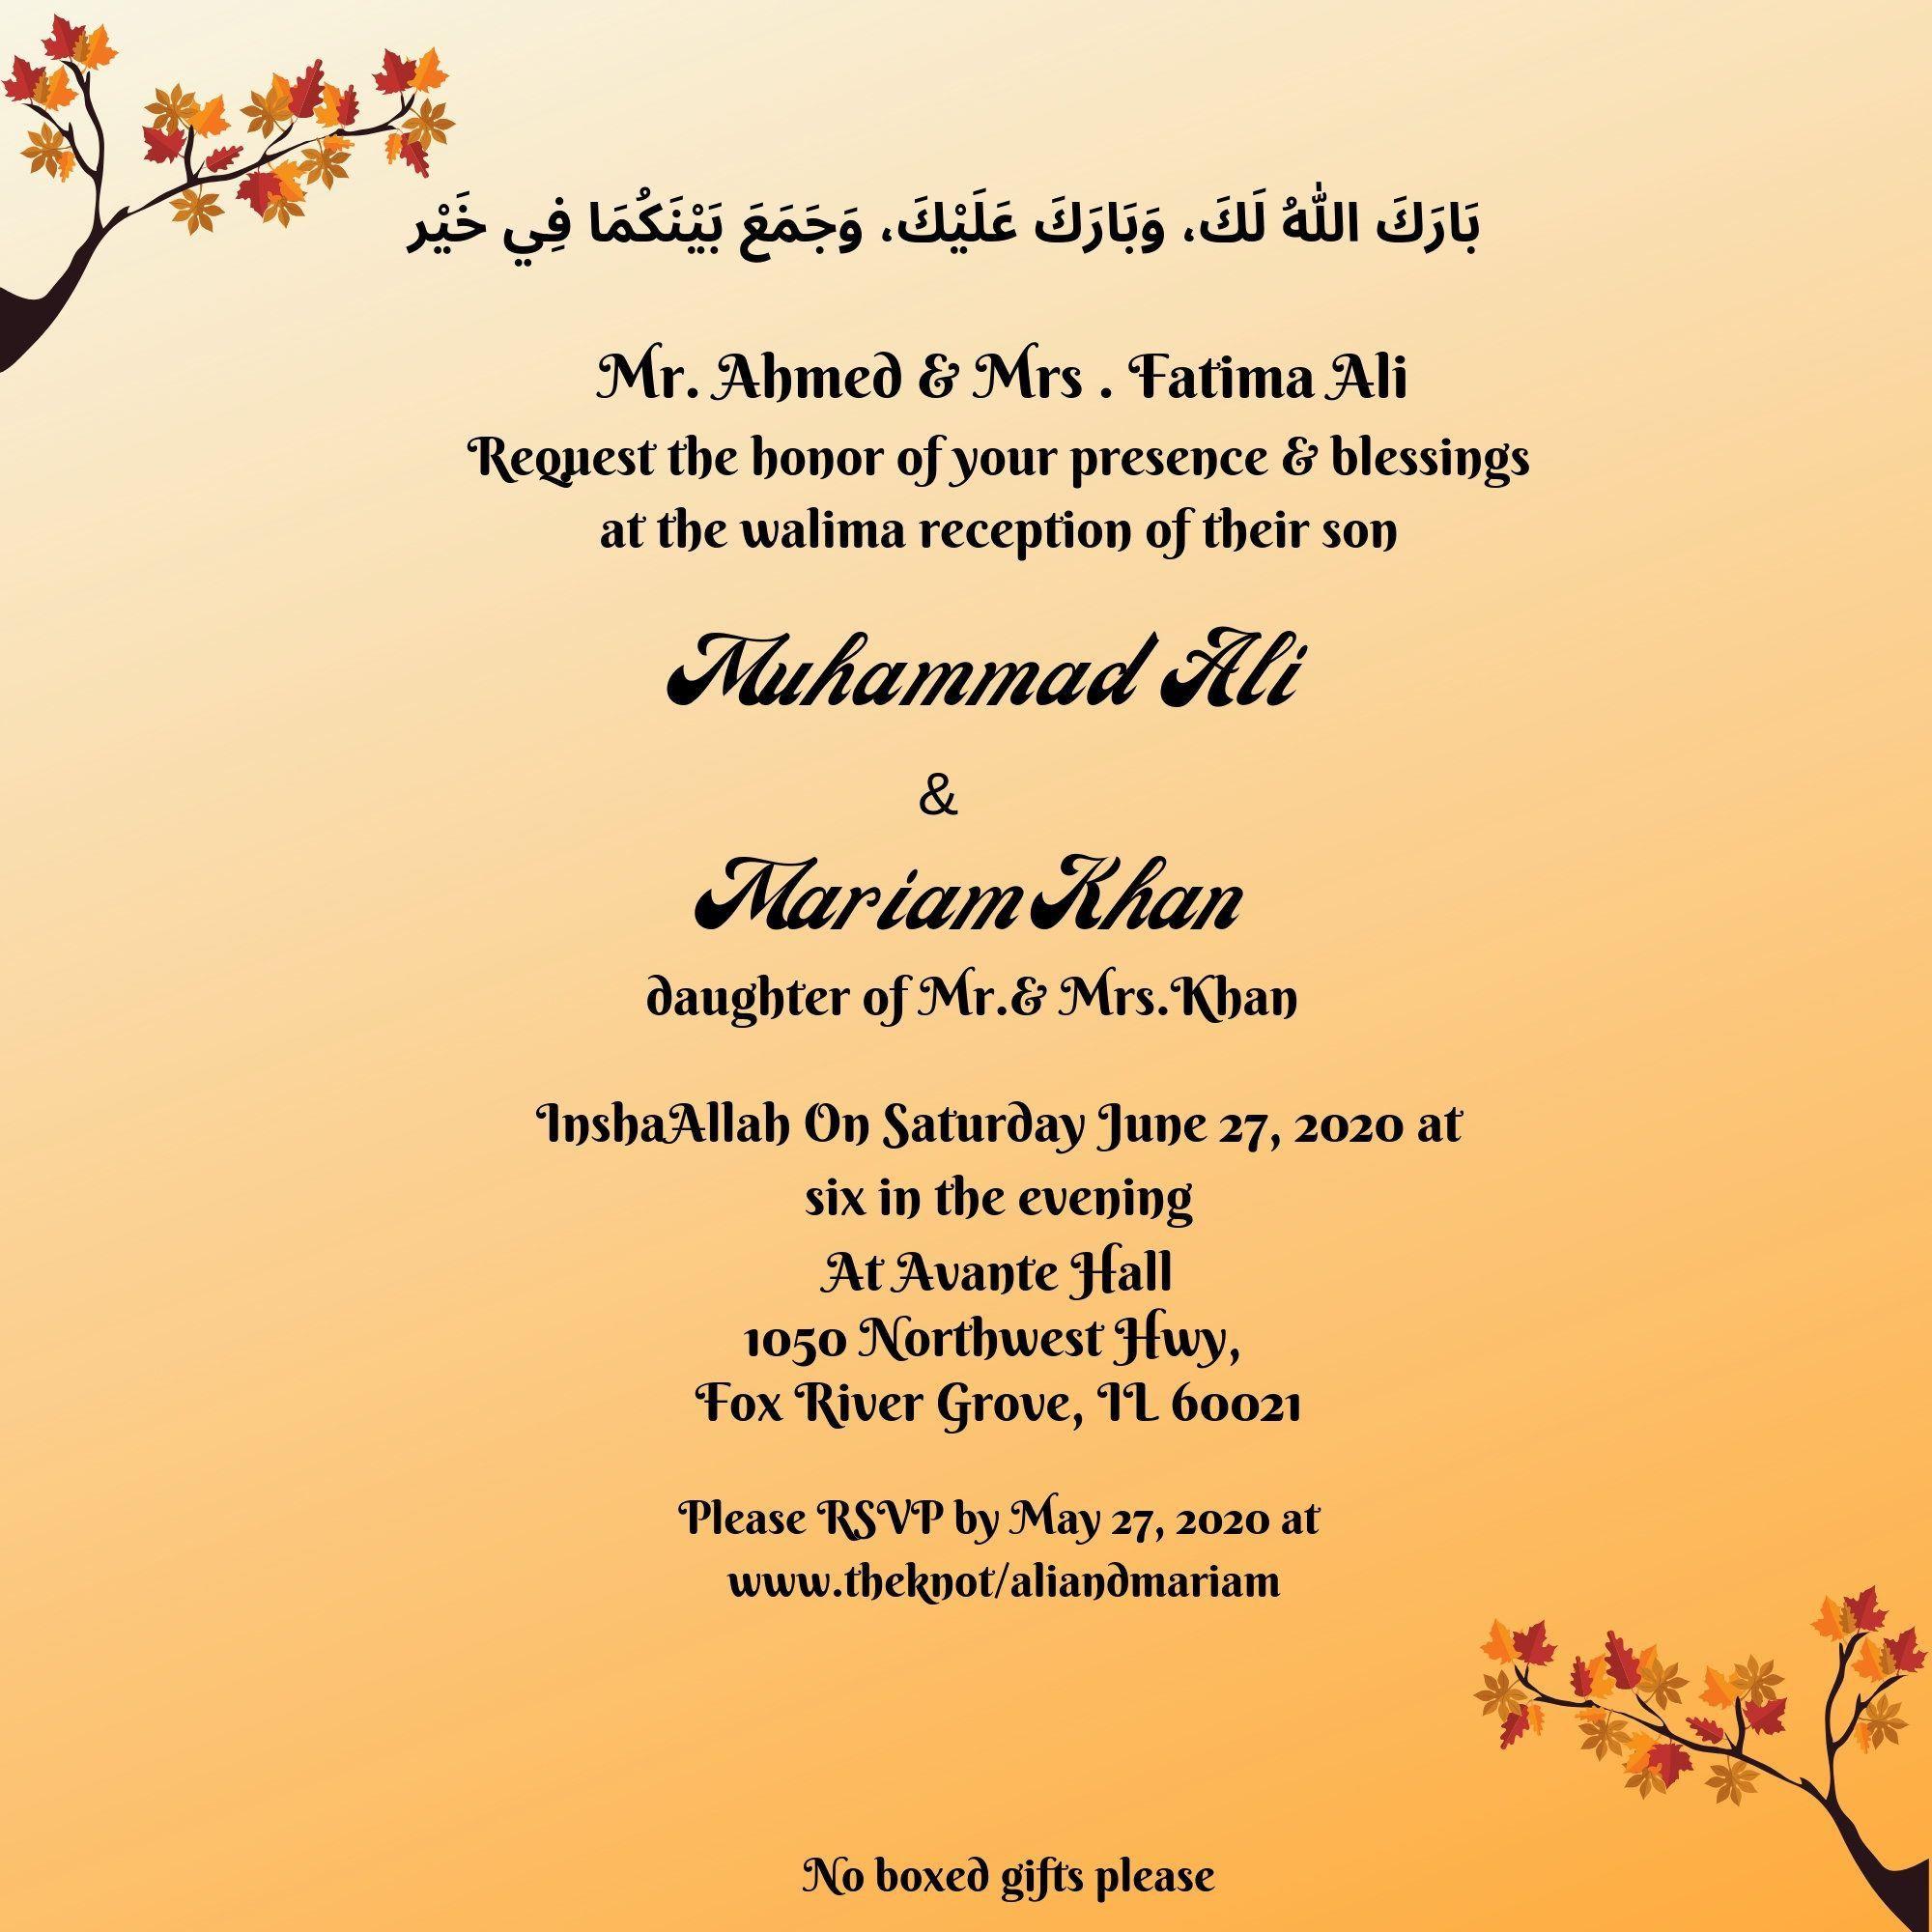 Islamic Wedding Invitation Templates Wedding Invitation Templates Islamic Wedding Wedding Invitations